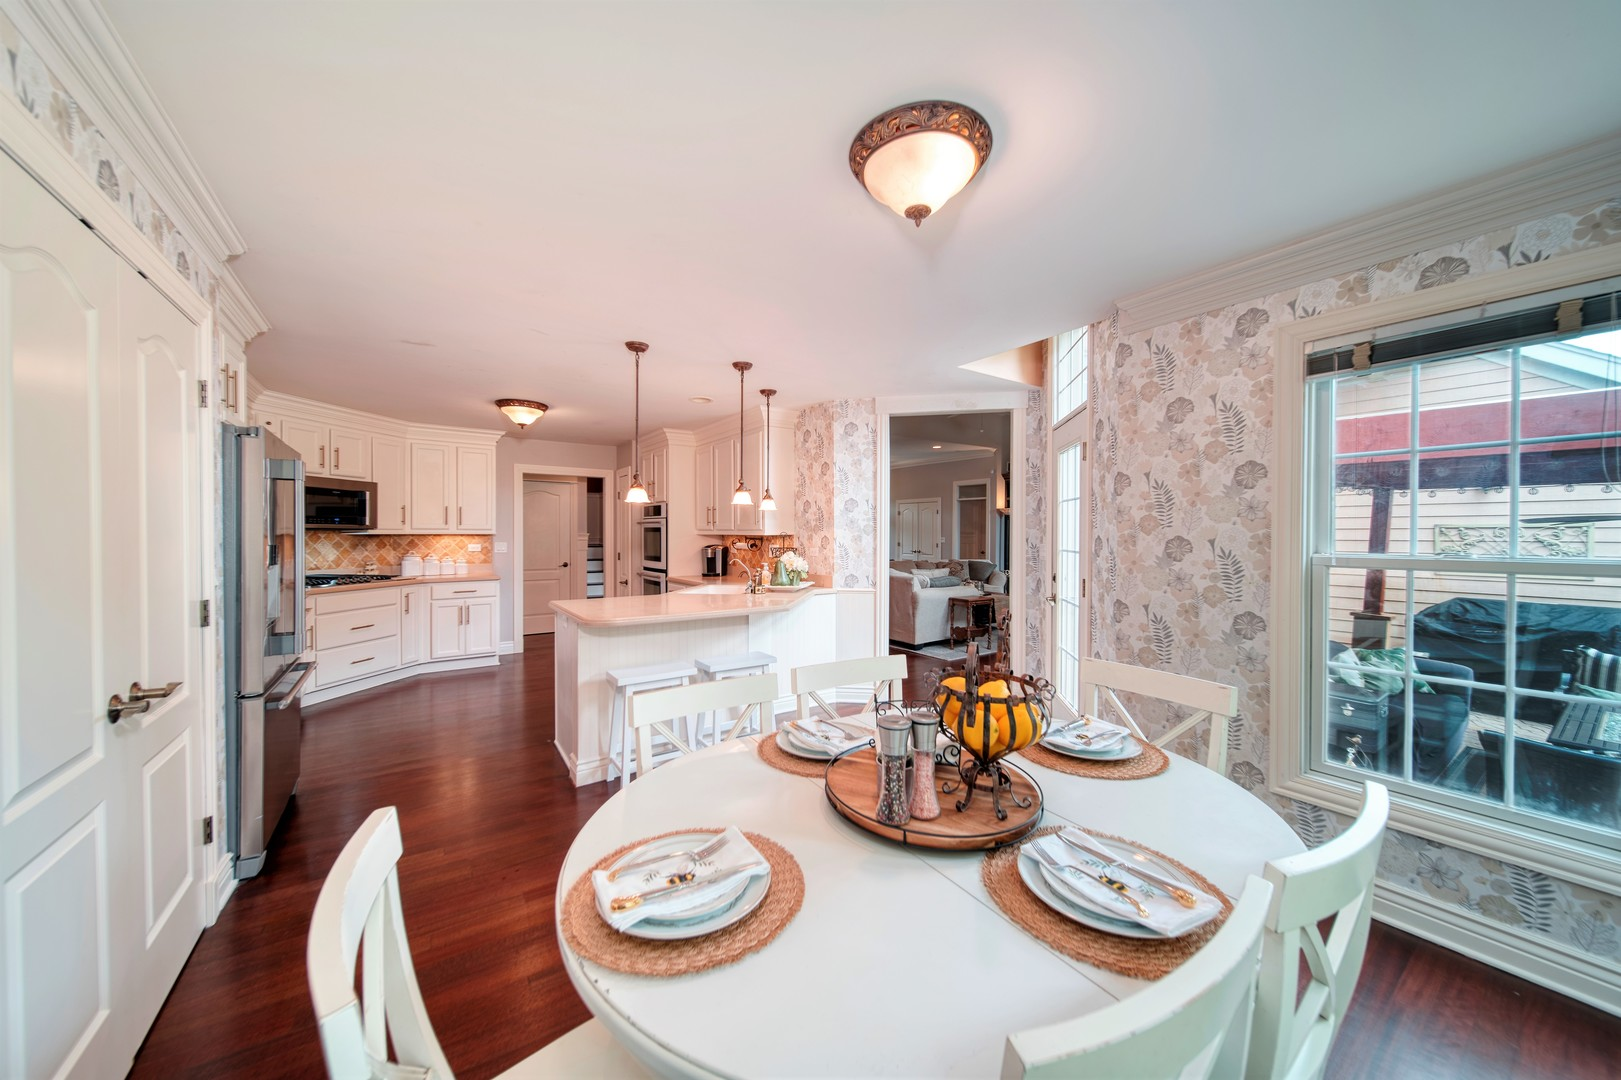 9715 Stonecastle Lane, Lakewood, Illinois 60014, 4 Bedrooms Bedrooms, ,3 BathroomsBathrooms,Residential,For Sale,Stonecastle,MRD11119238